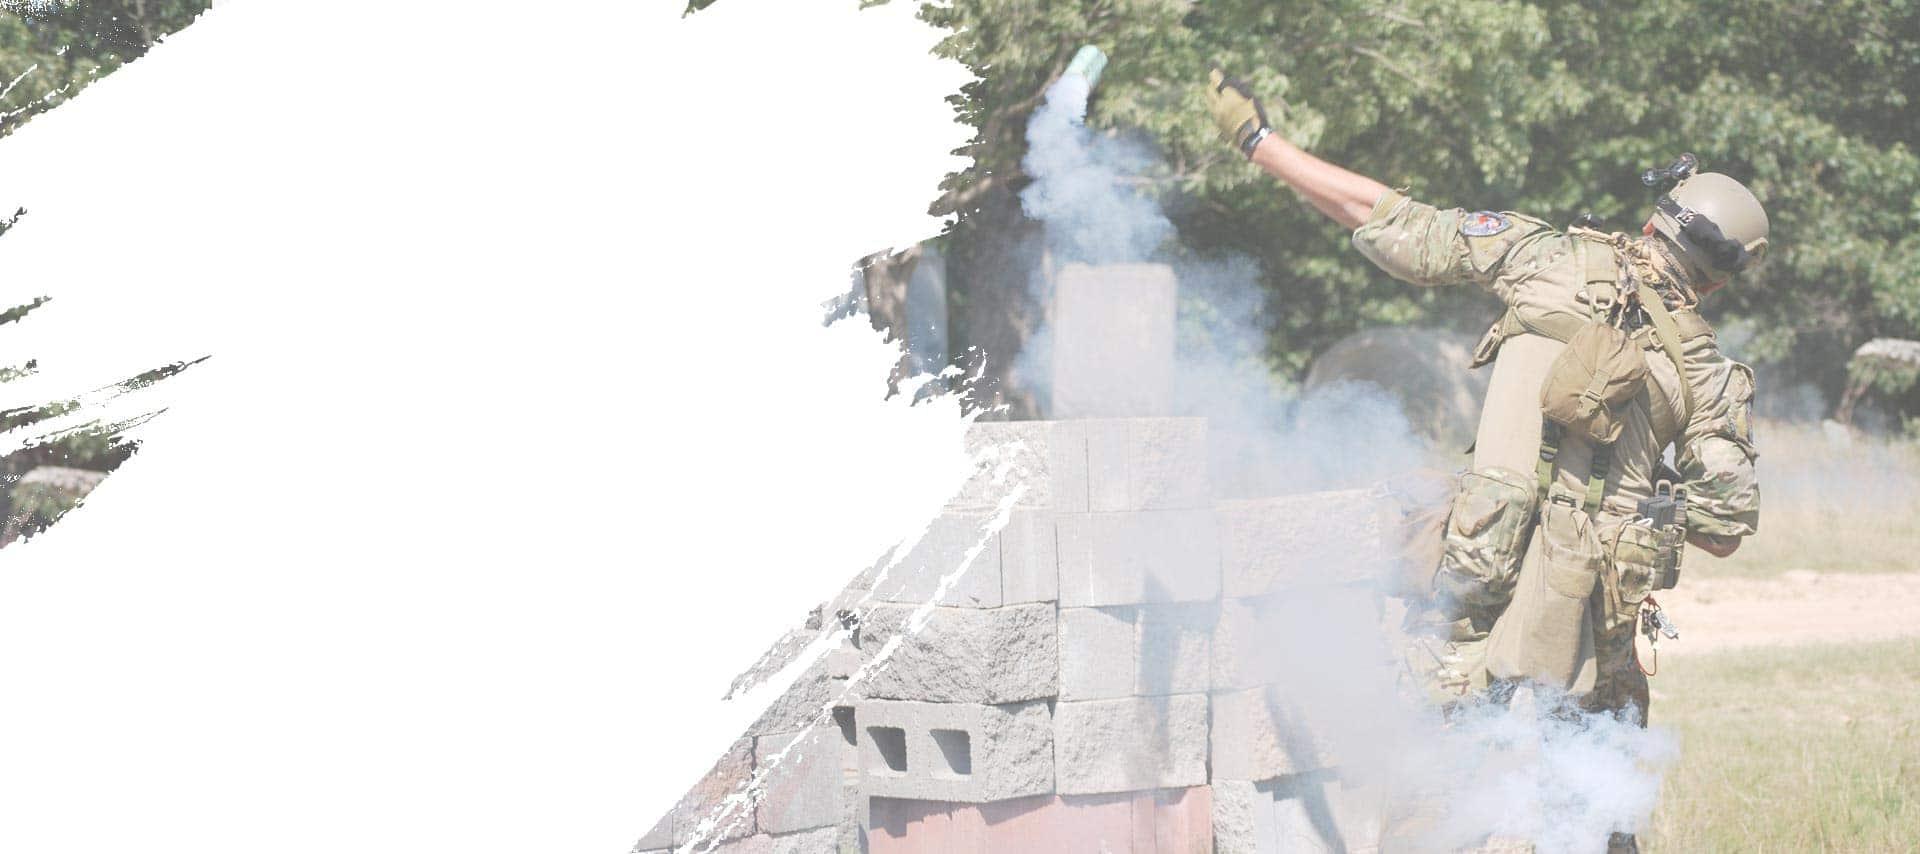 sport-smoke-background-paintball-2